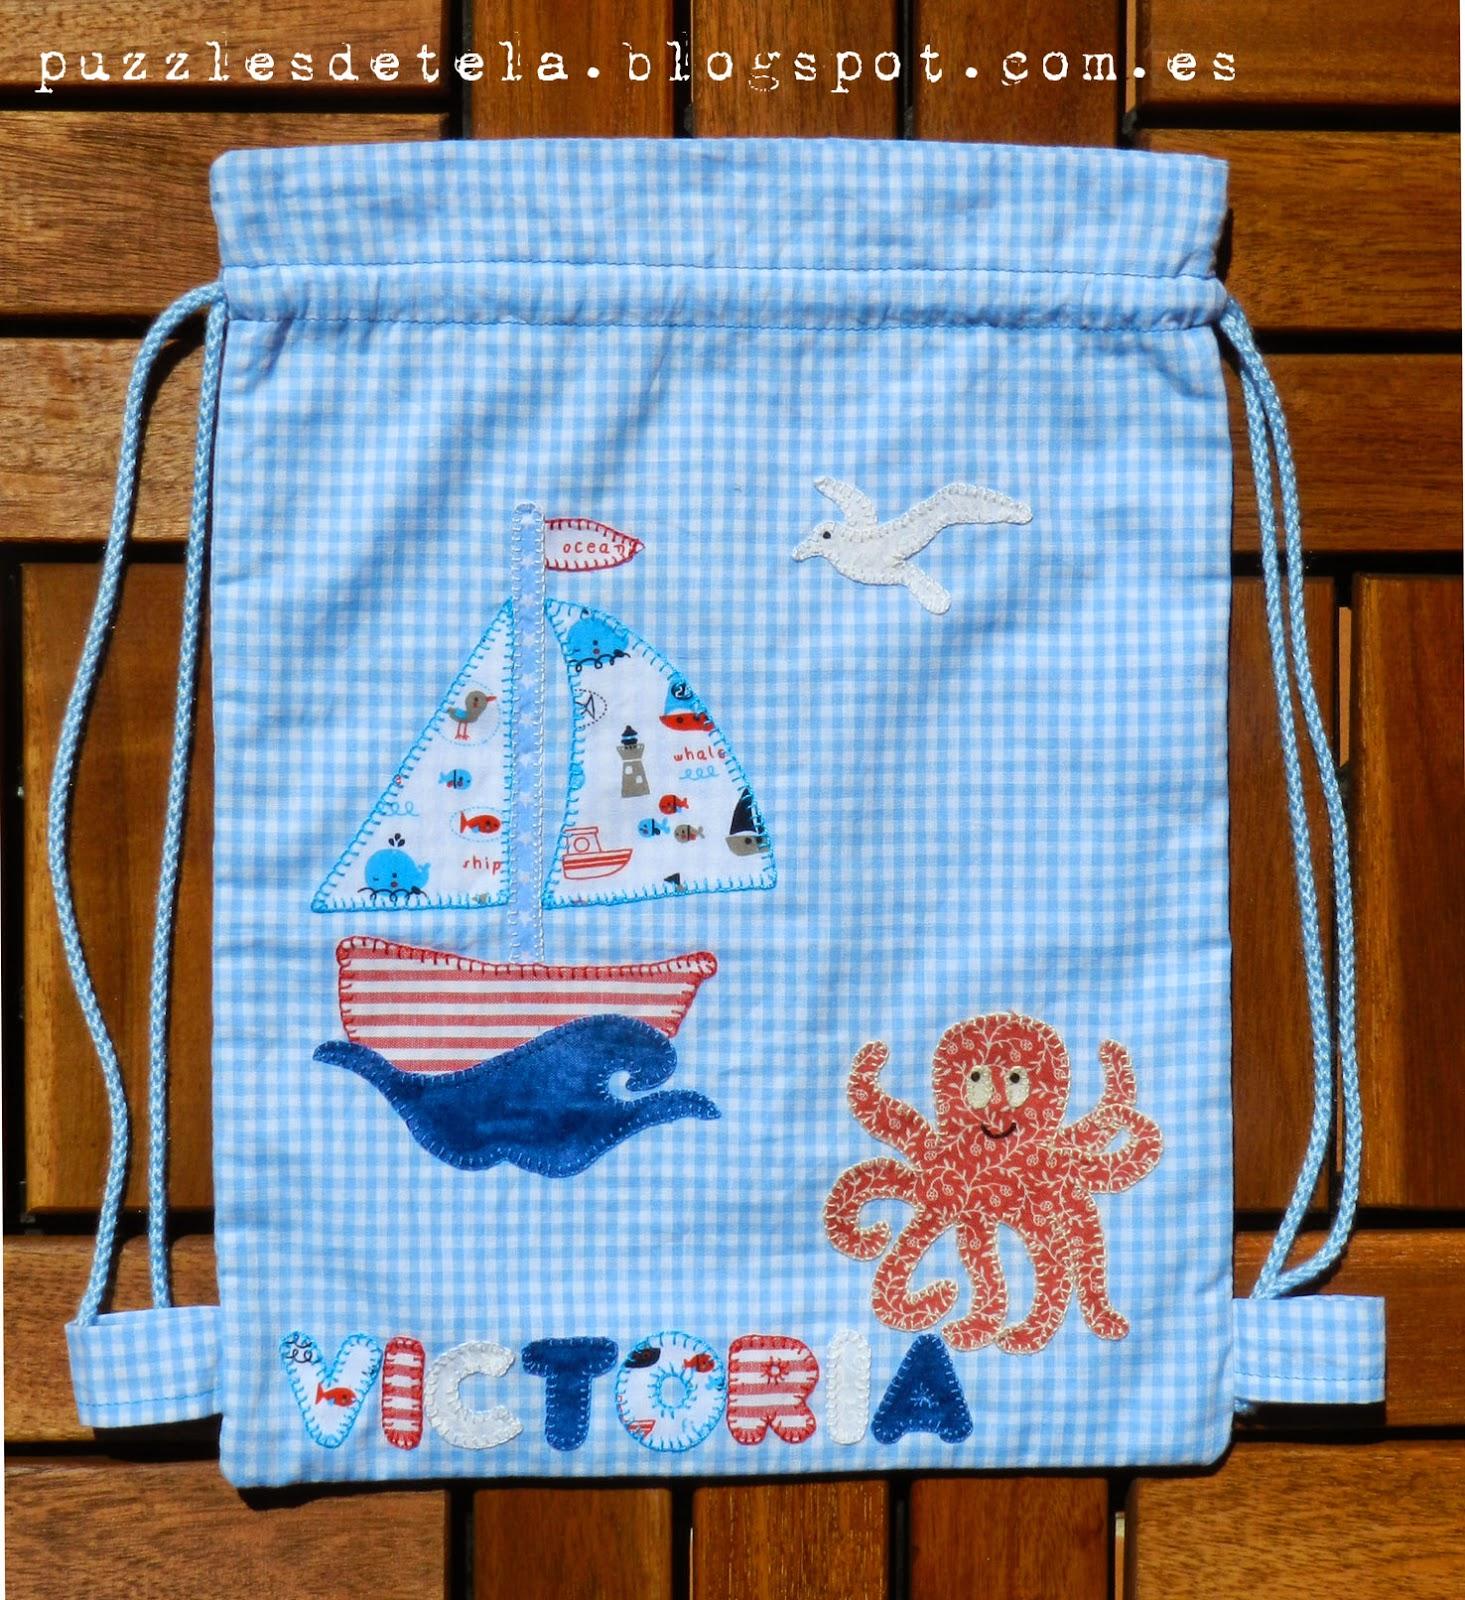 Patchwork, mochila para niños patchwork, mochila patchwork, aplicaciones patchwork, kids, verano, pulpo, bolsa merienda patchwork, bolsa para la merienda,